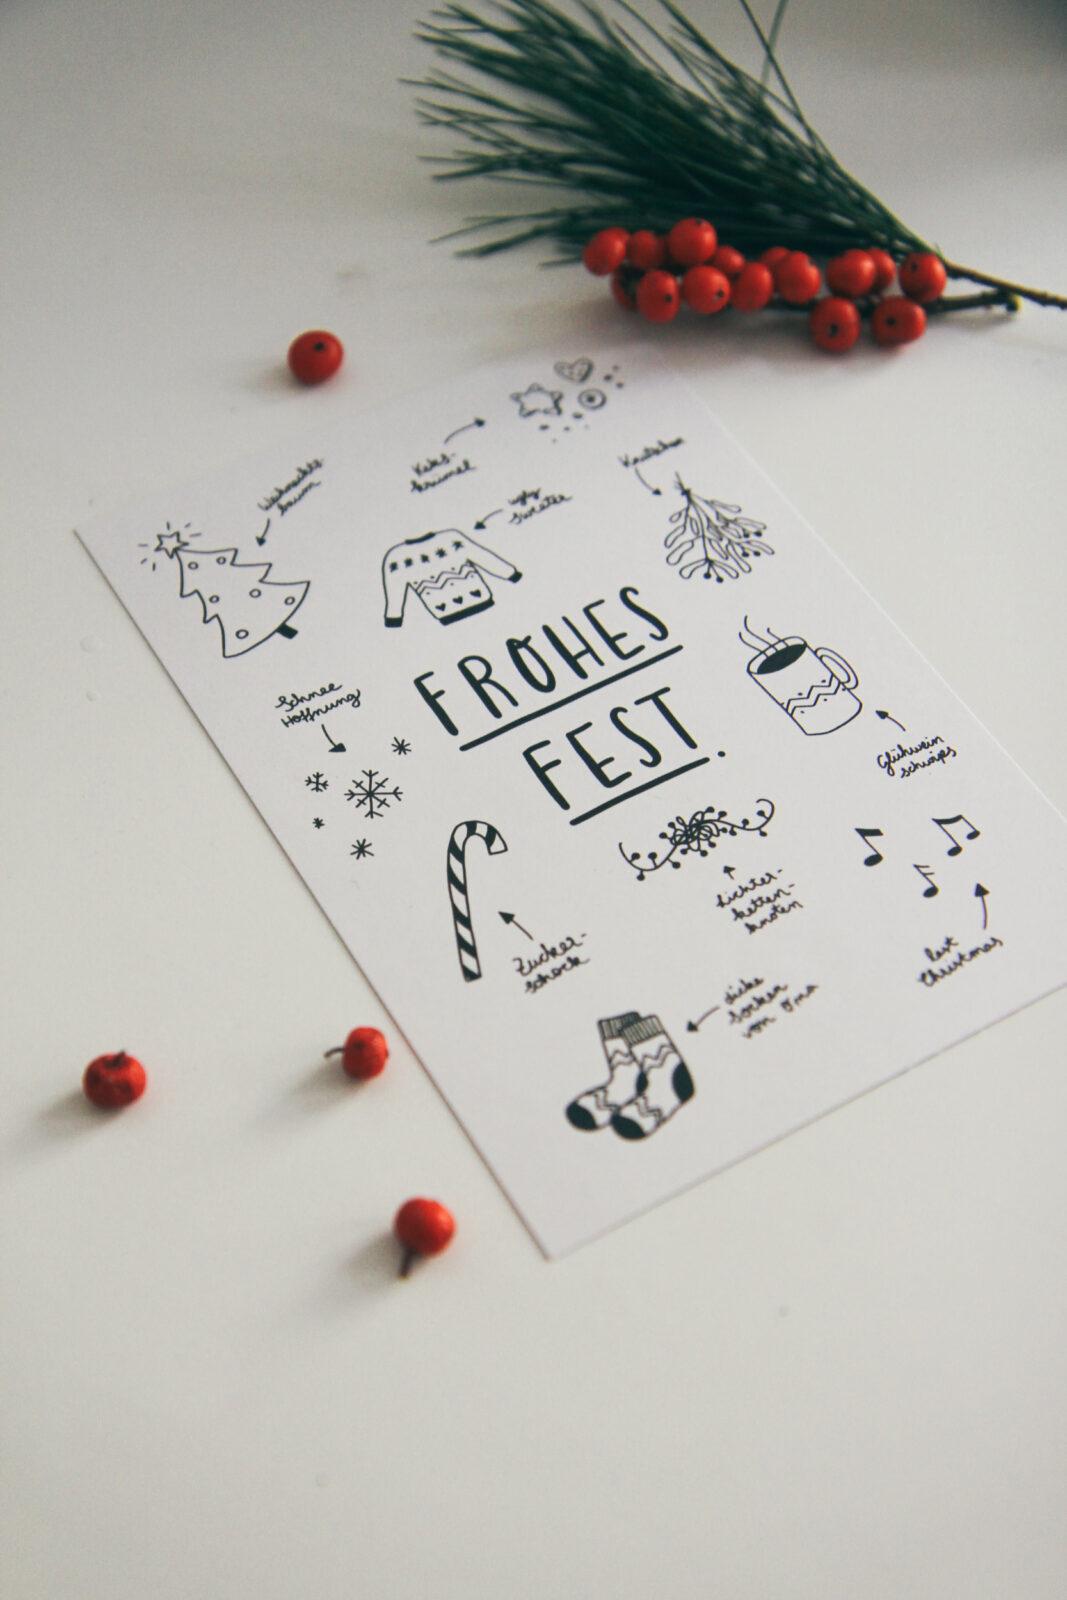 Weihnachtskarten Smaracuja Frohes fest Doodle Ugly Sweater Mistelzweig Glühwein Last Christmas